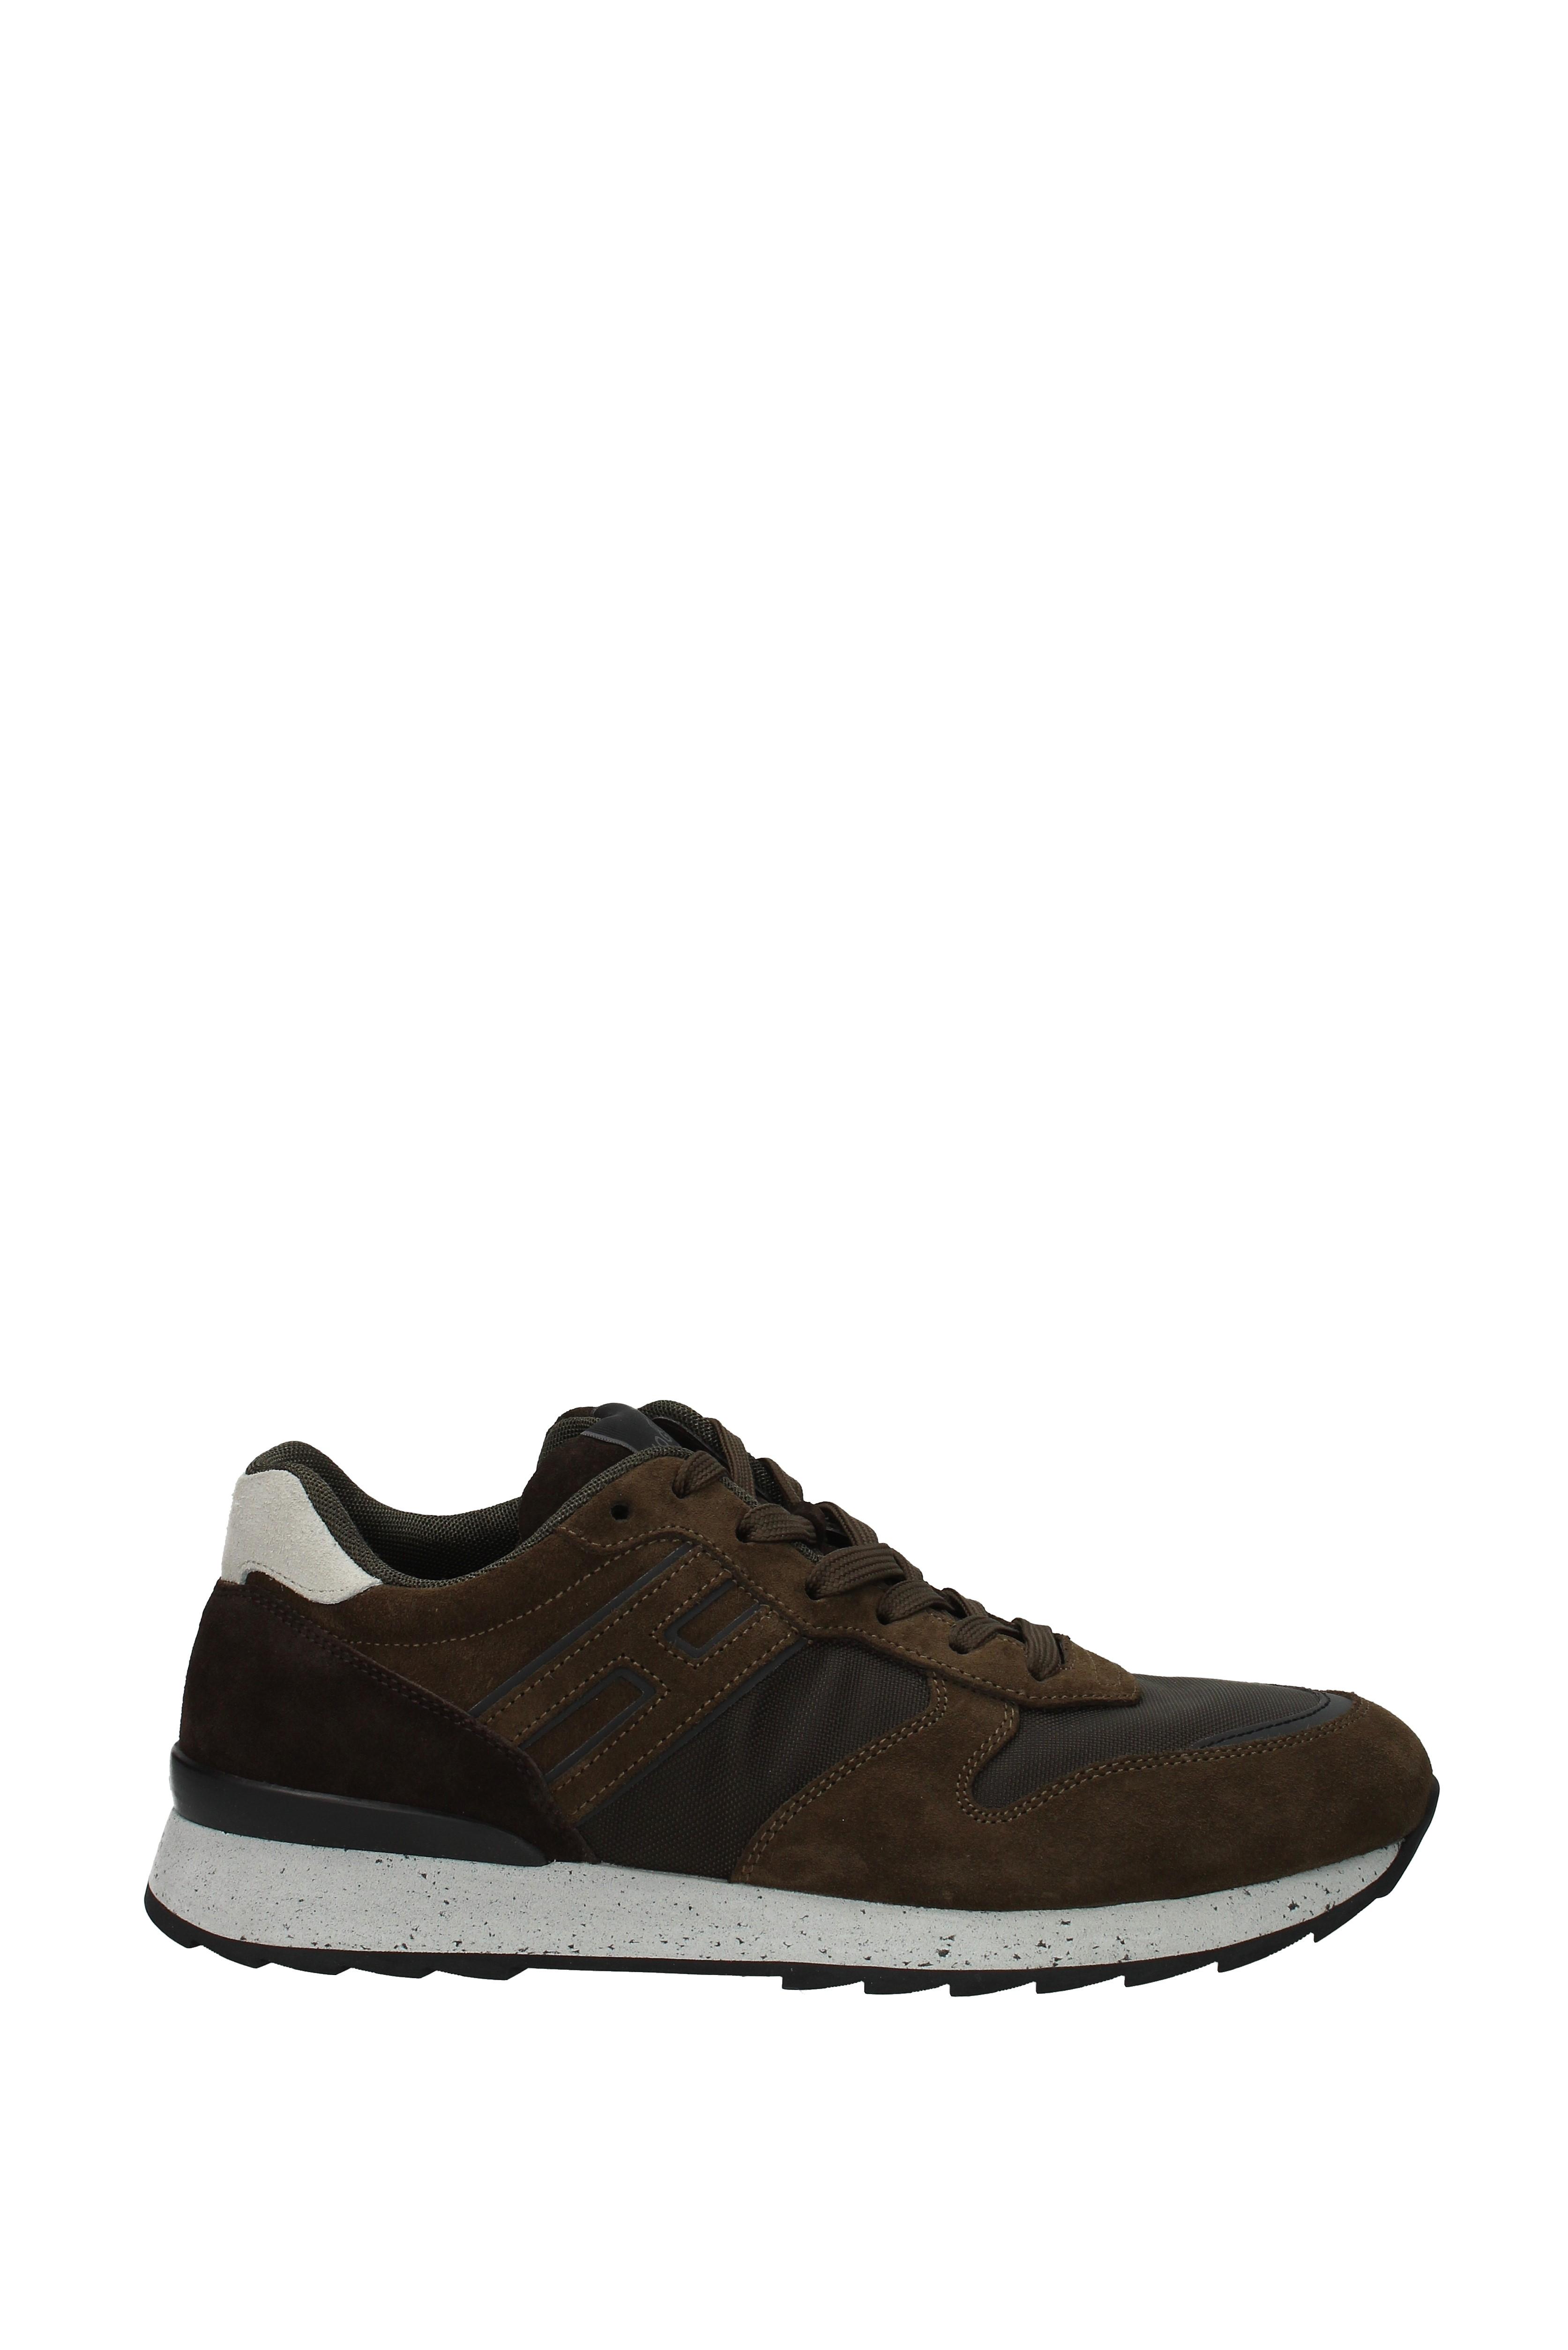 Sneakers Sneakers Sneakers Hogan hombre - Camoscio (HXM2610R676HJE) 1d546a